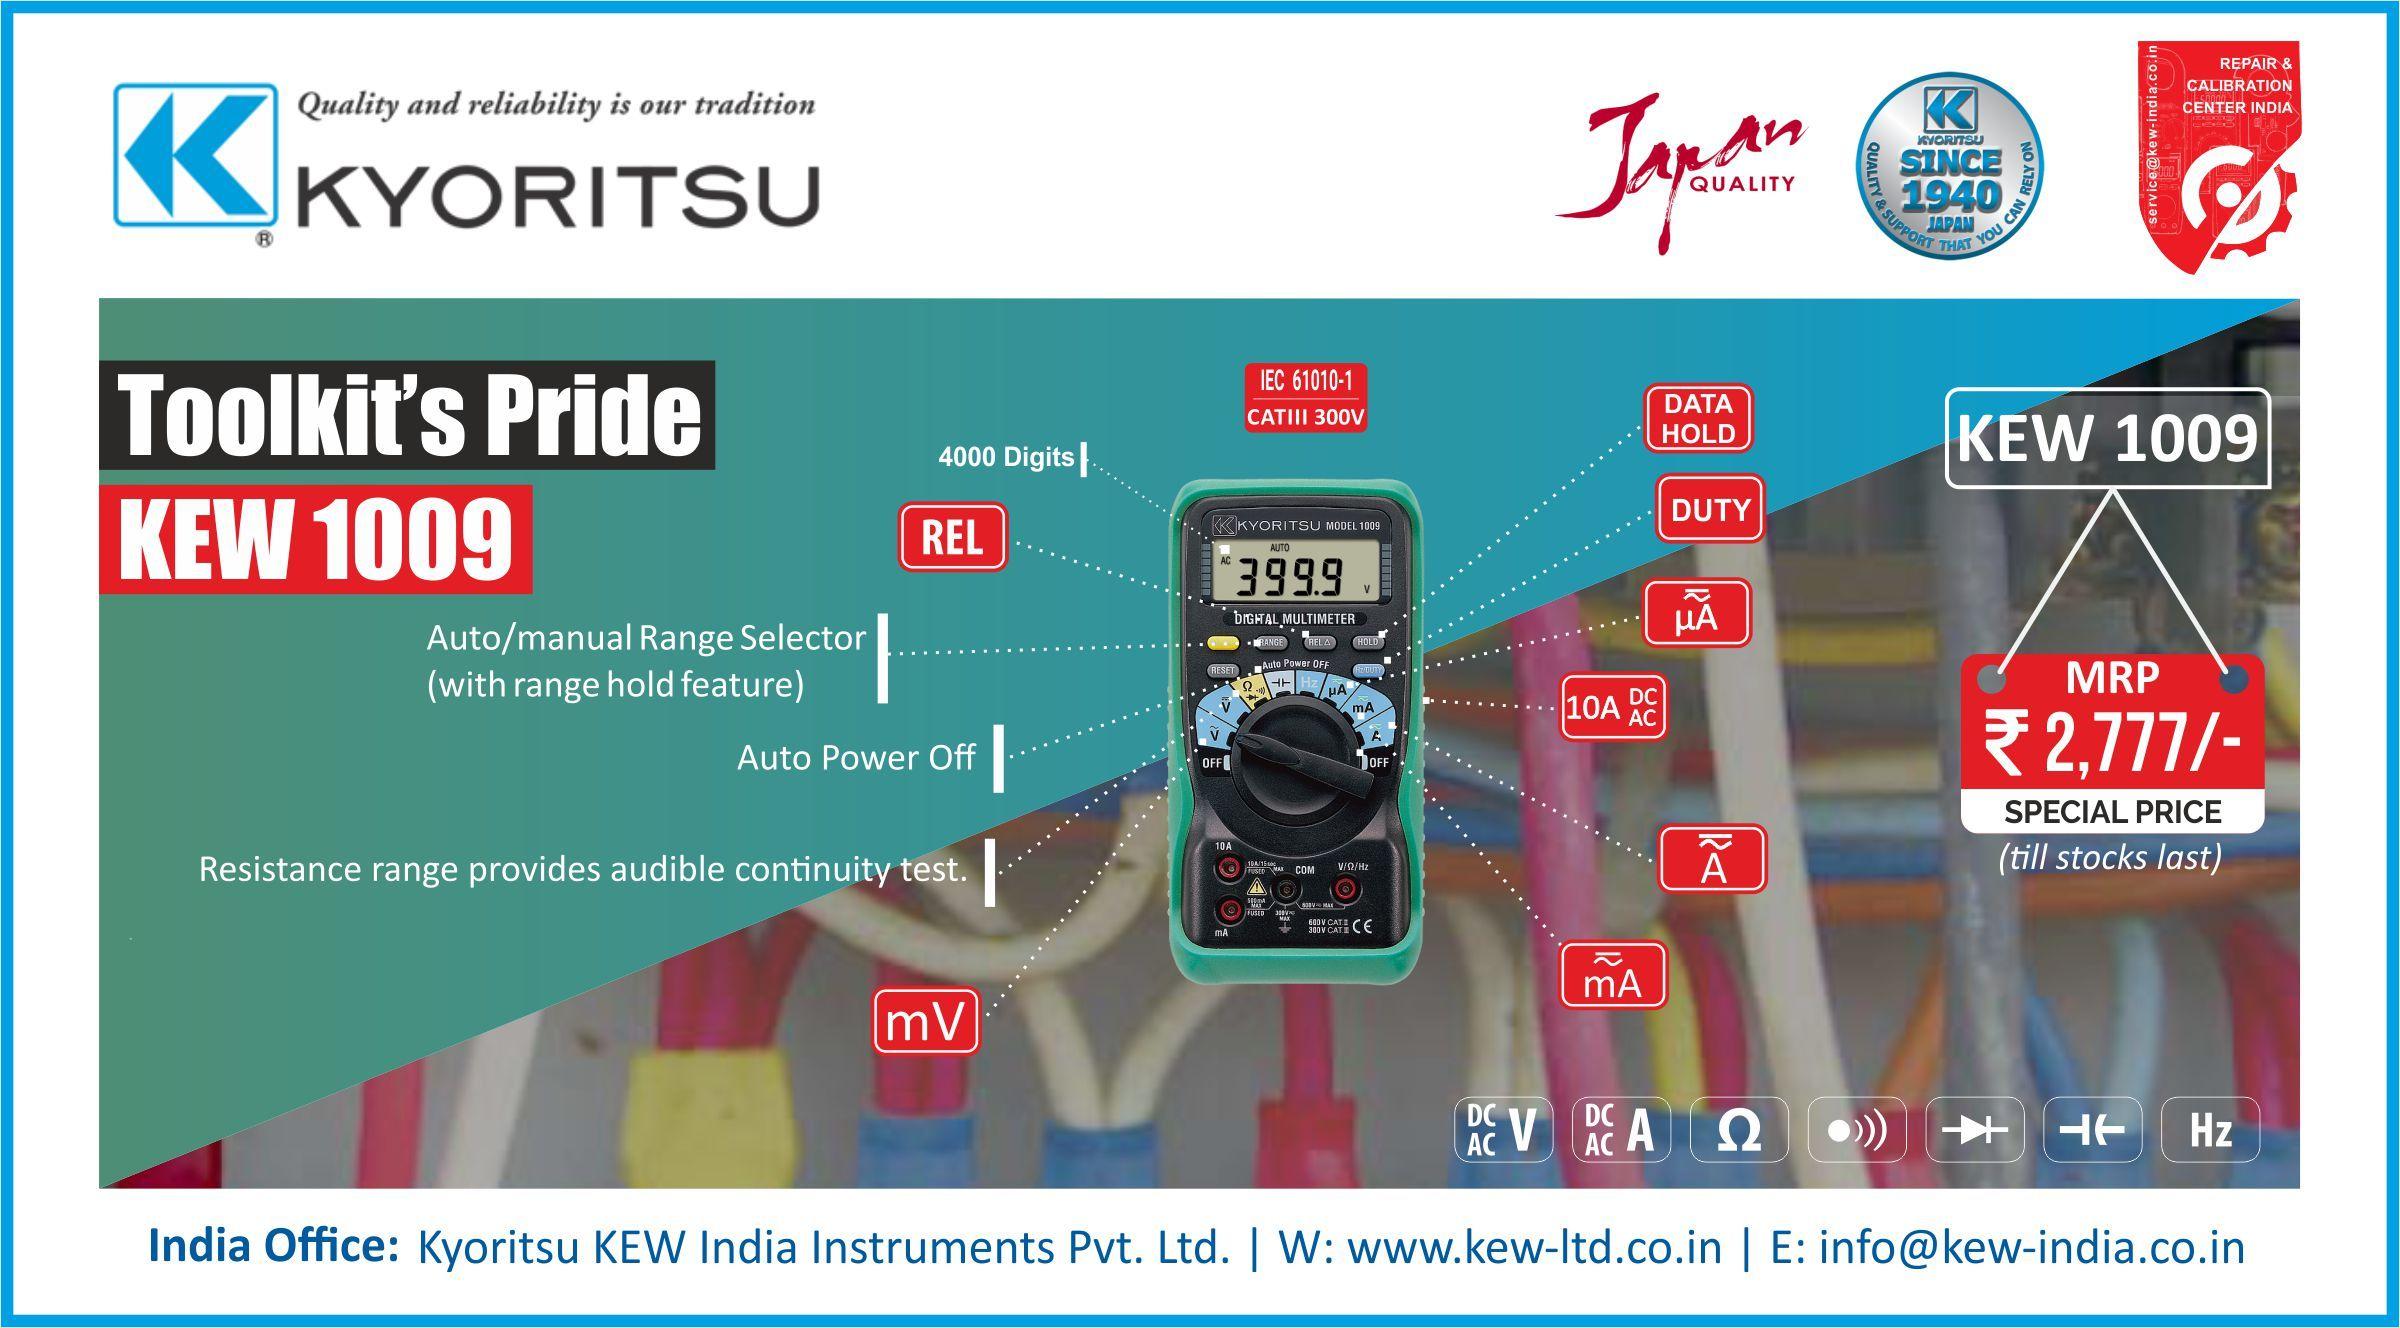 Kyoritsu Digital Multimeter 400mV-600V KEW-1009